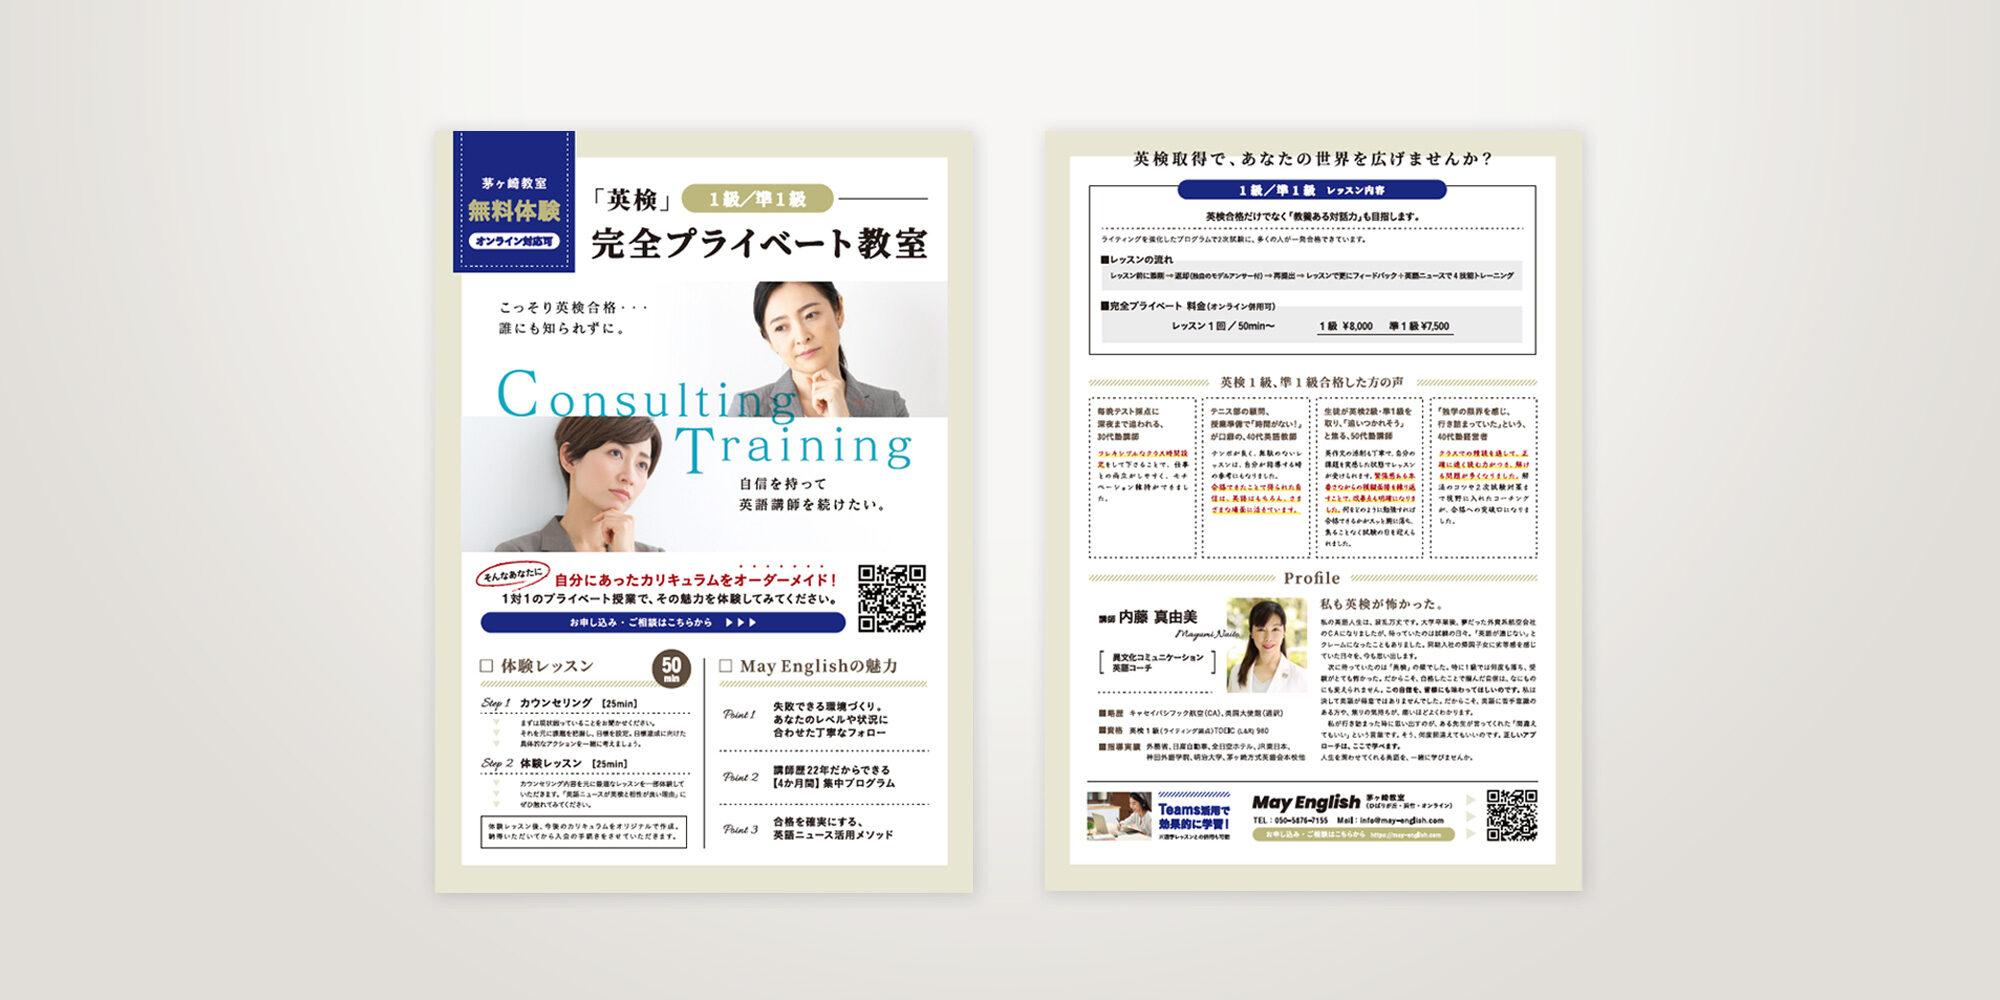 英語教室 mayenglish 印刷物